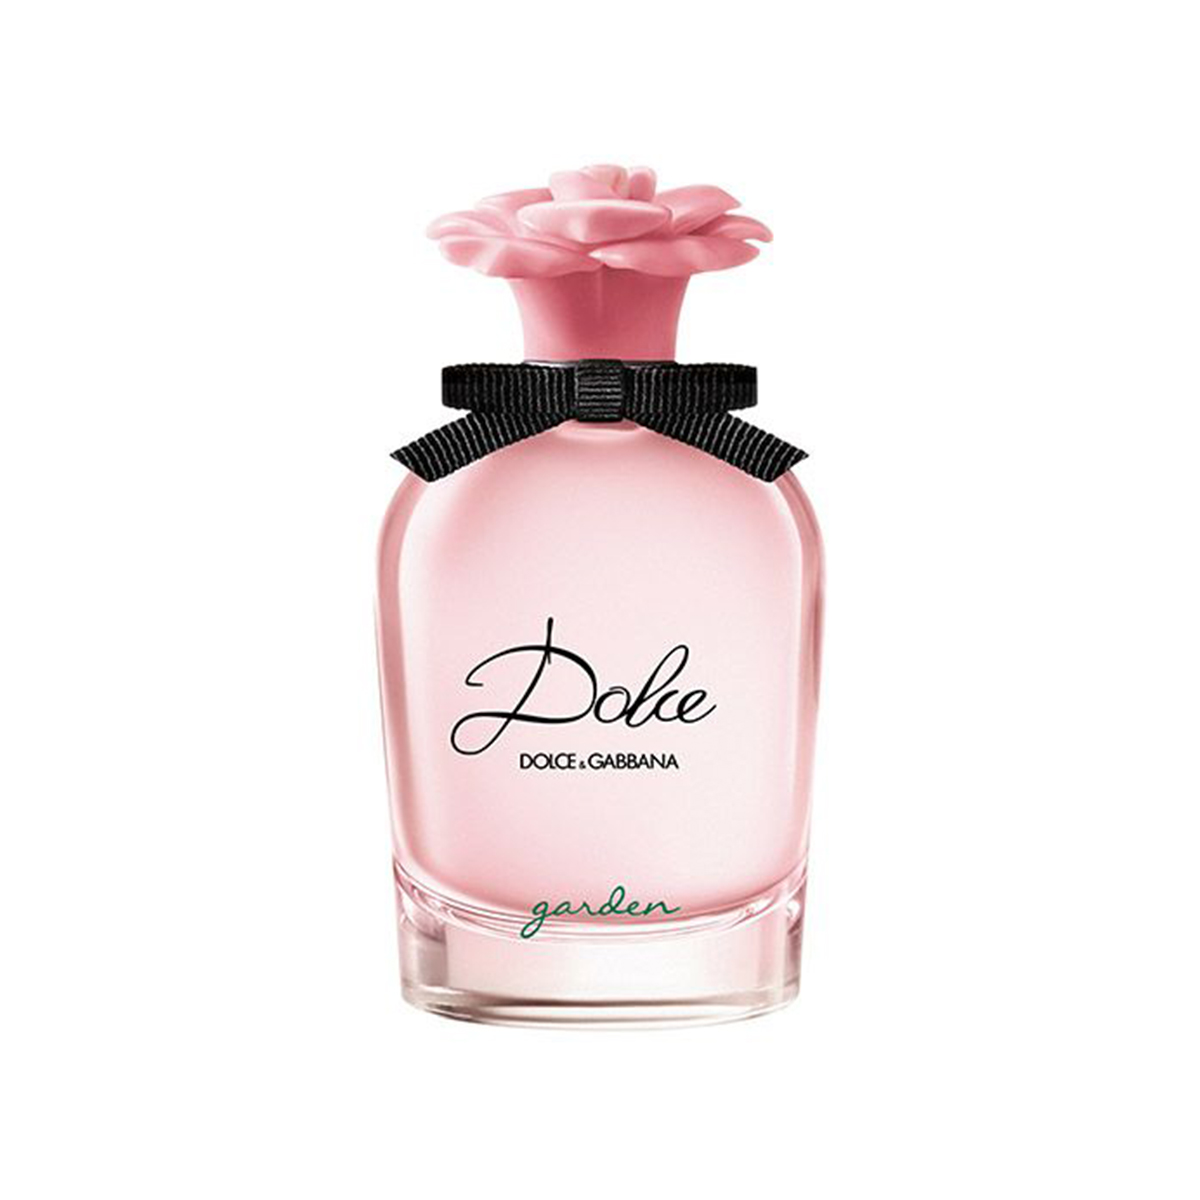 Dolce gabbana dolce garden eau de parfum 75ml vaporizador